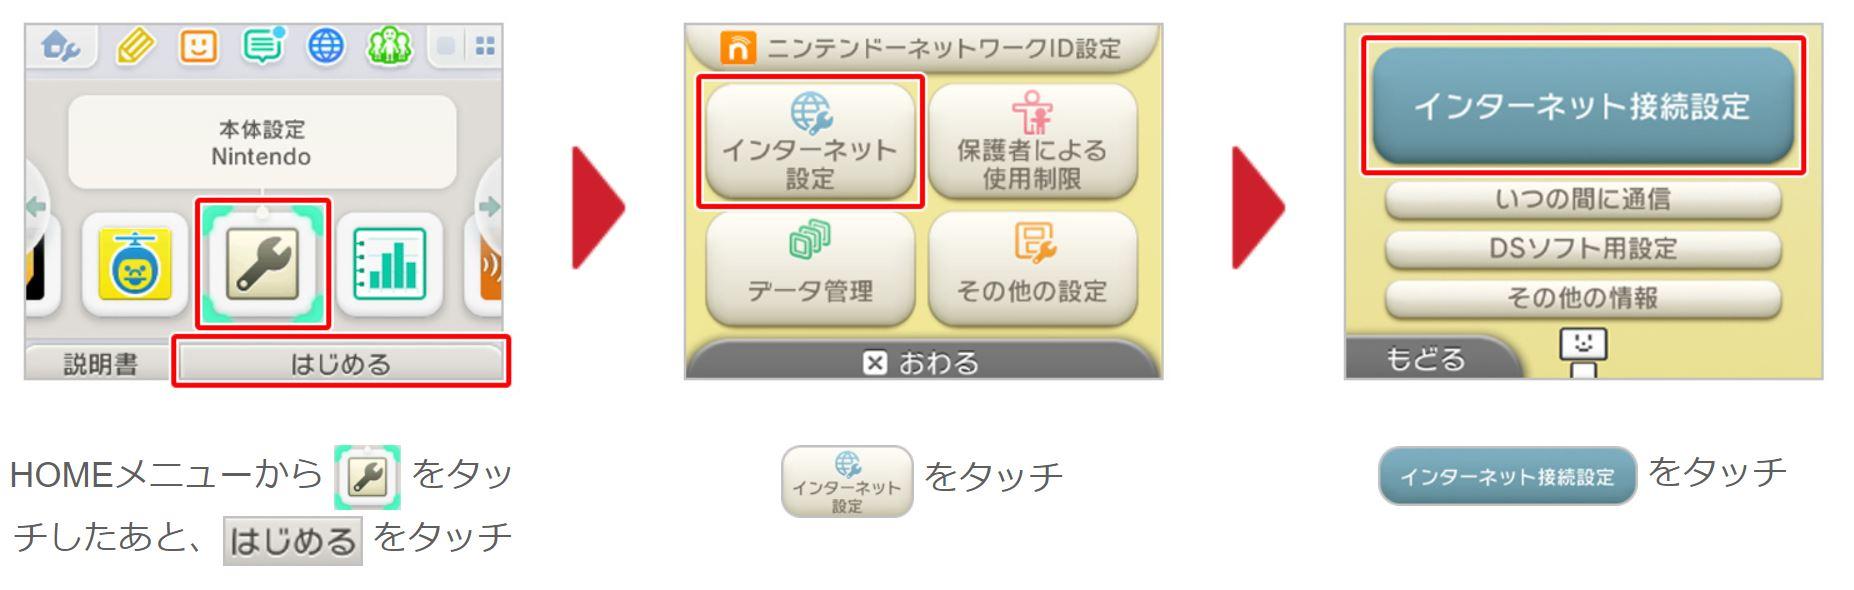 3DS_接続方法